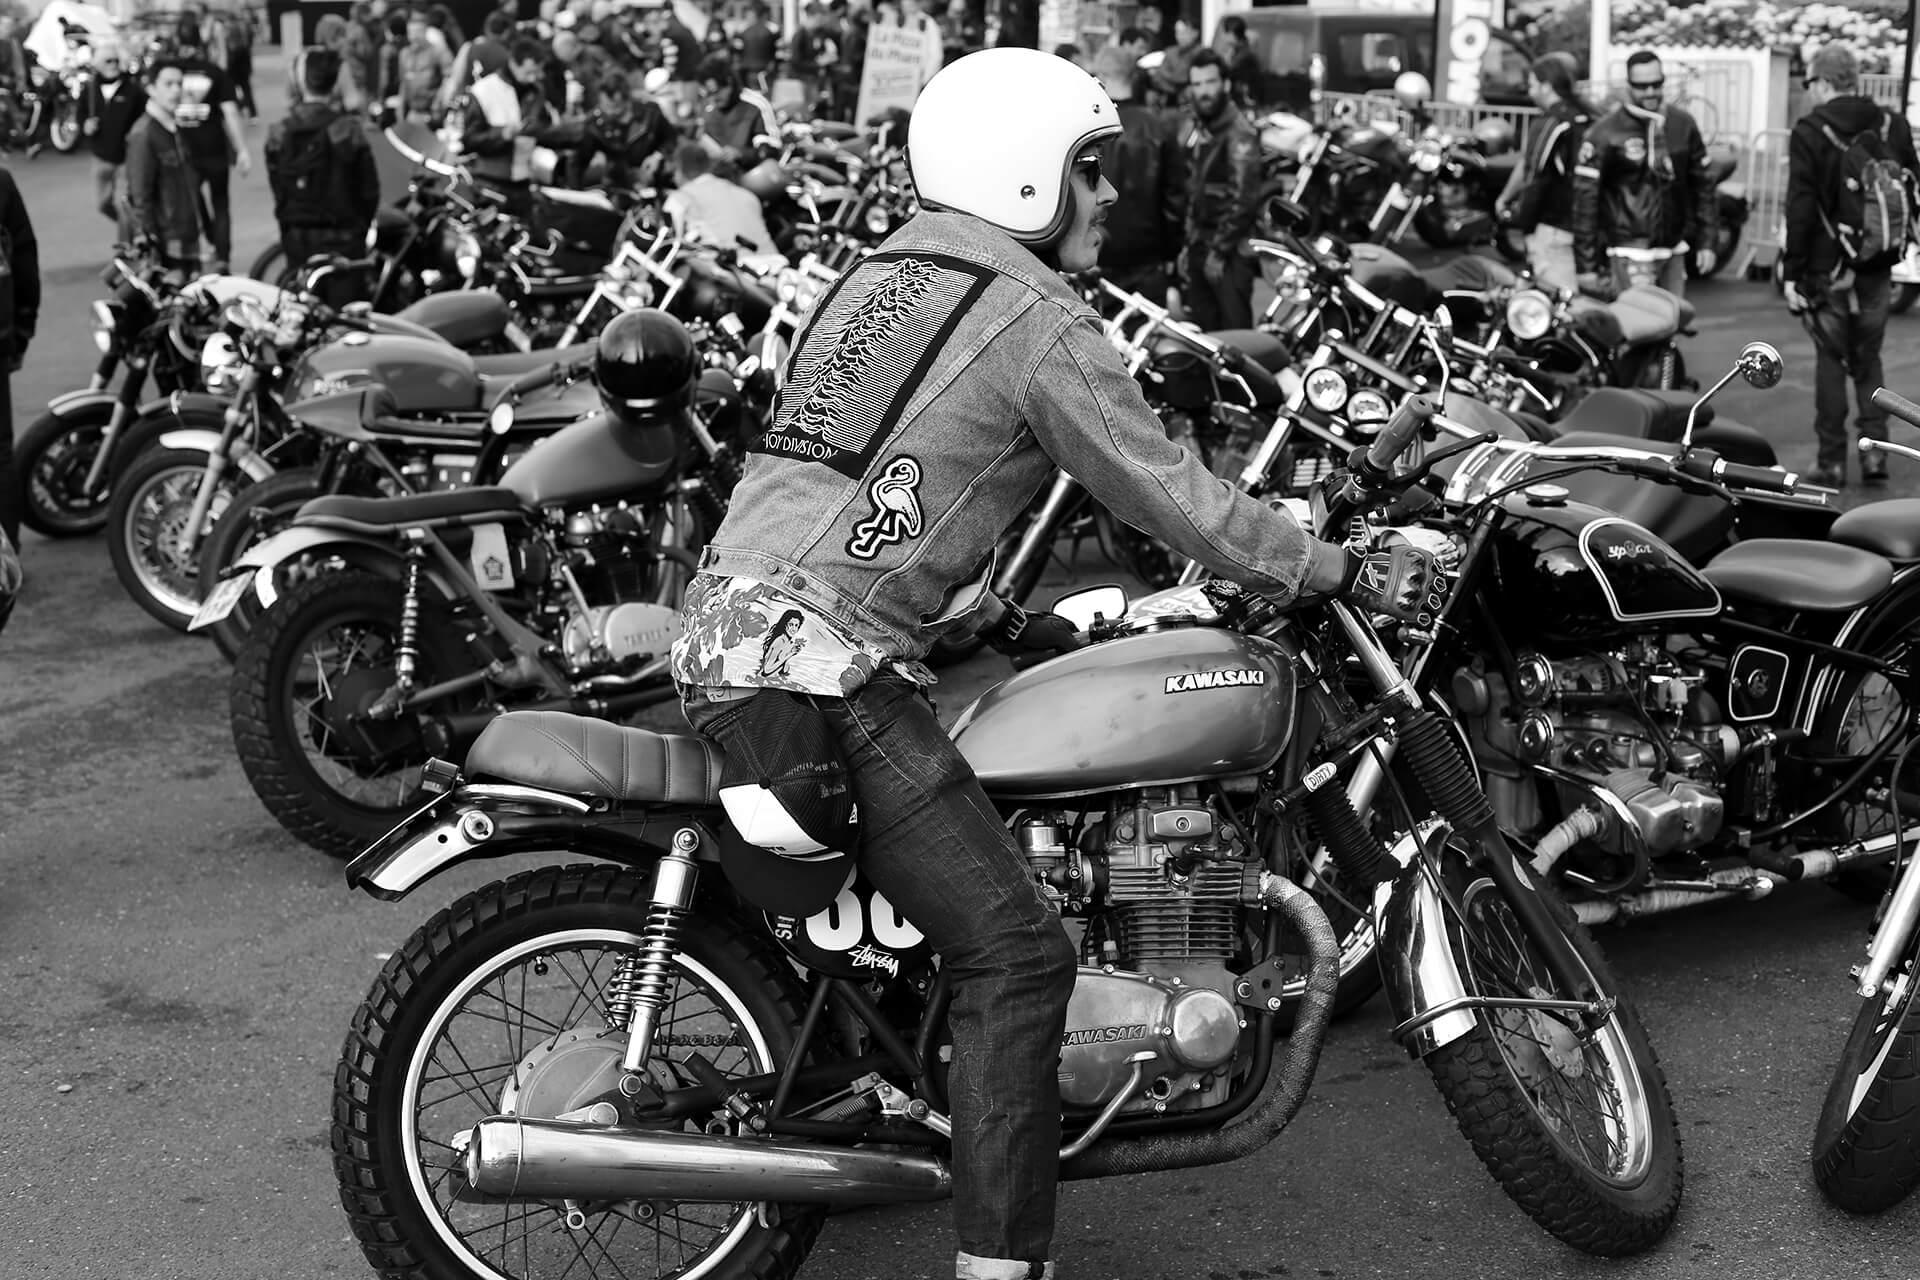 Wheels, Waves, Wheels and Waves, fashion, helmet, sparkle, biker, motorcycle, bike, france, film, photography, event, WeAreShuffle, bikes, agency